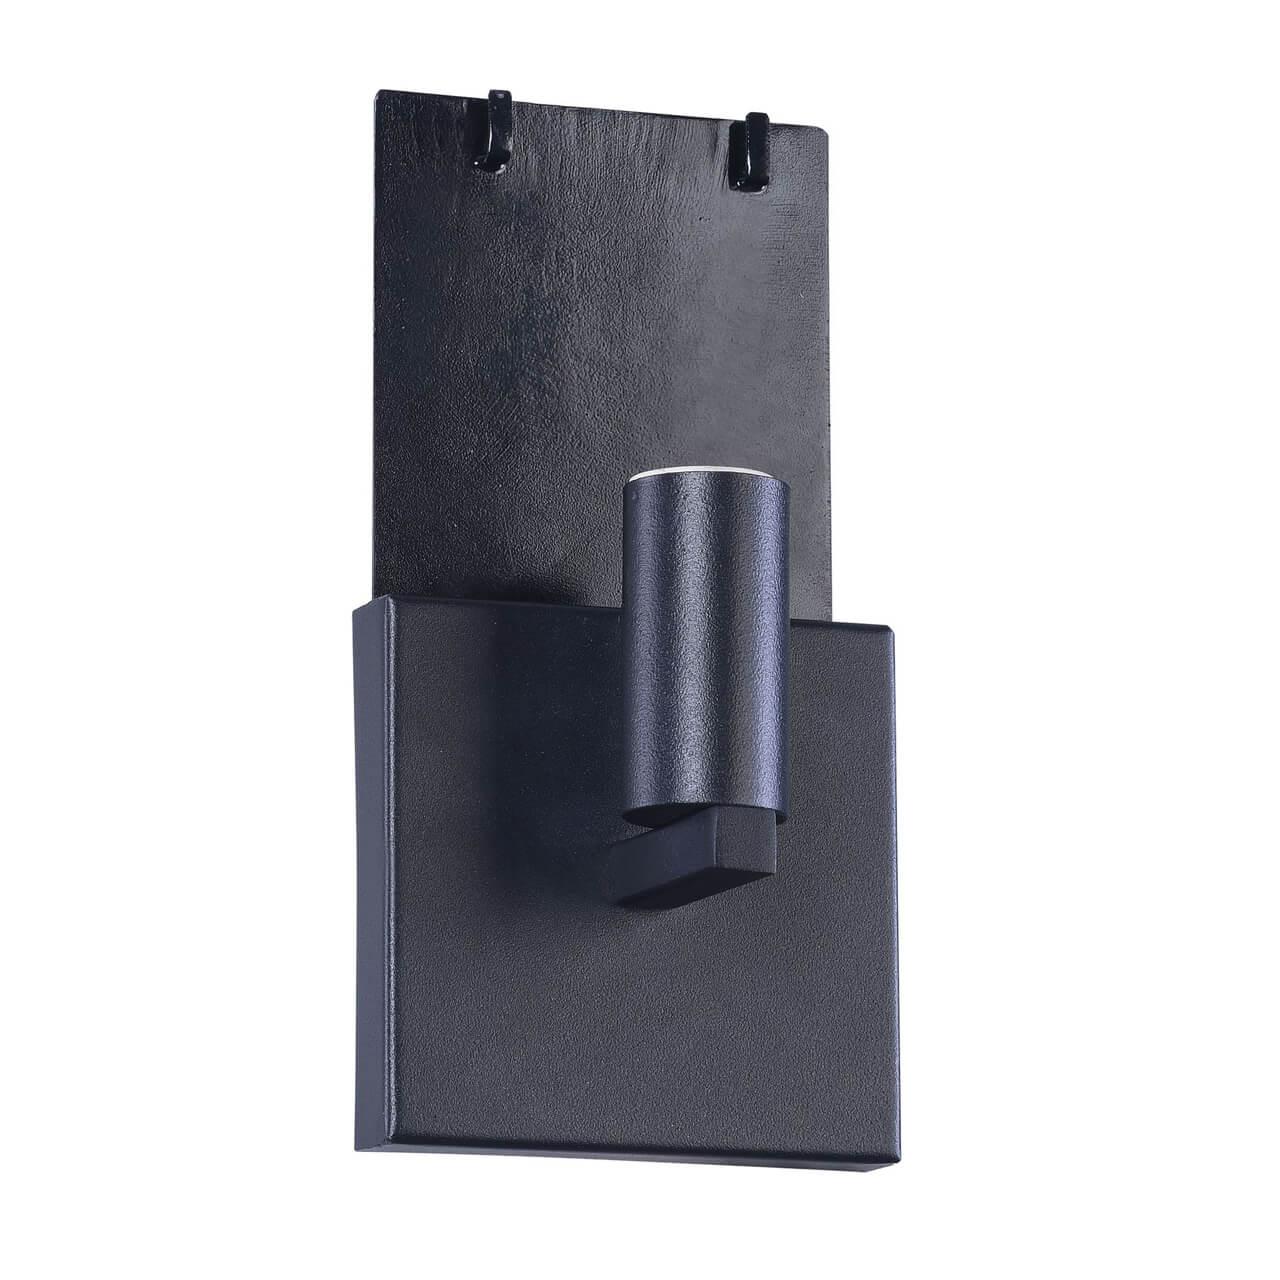 Основа для бра Maytoni MOD974-WLBase-01-Black Toronto